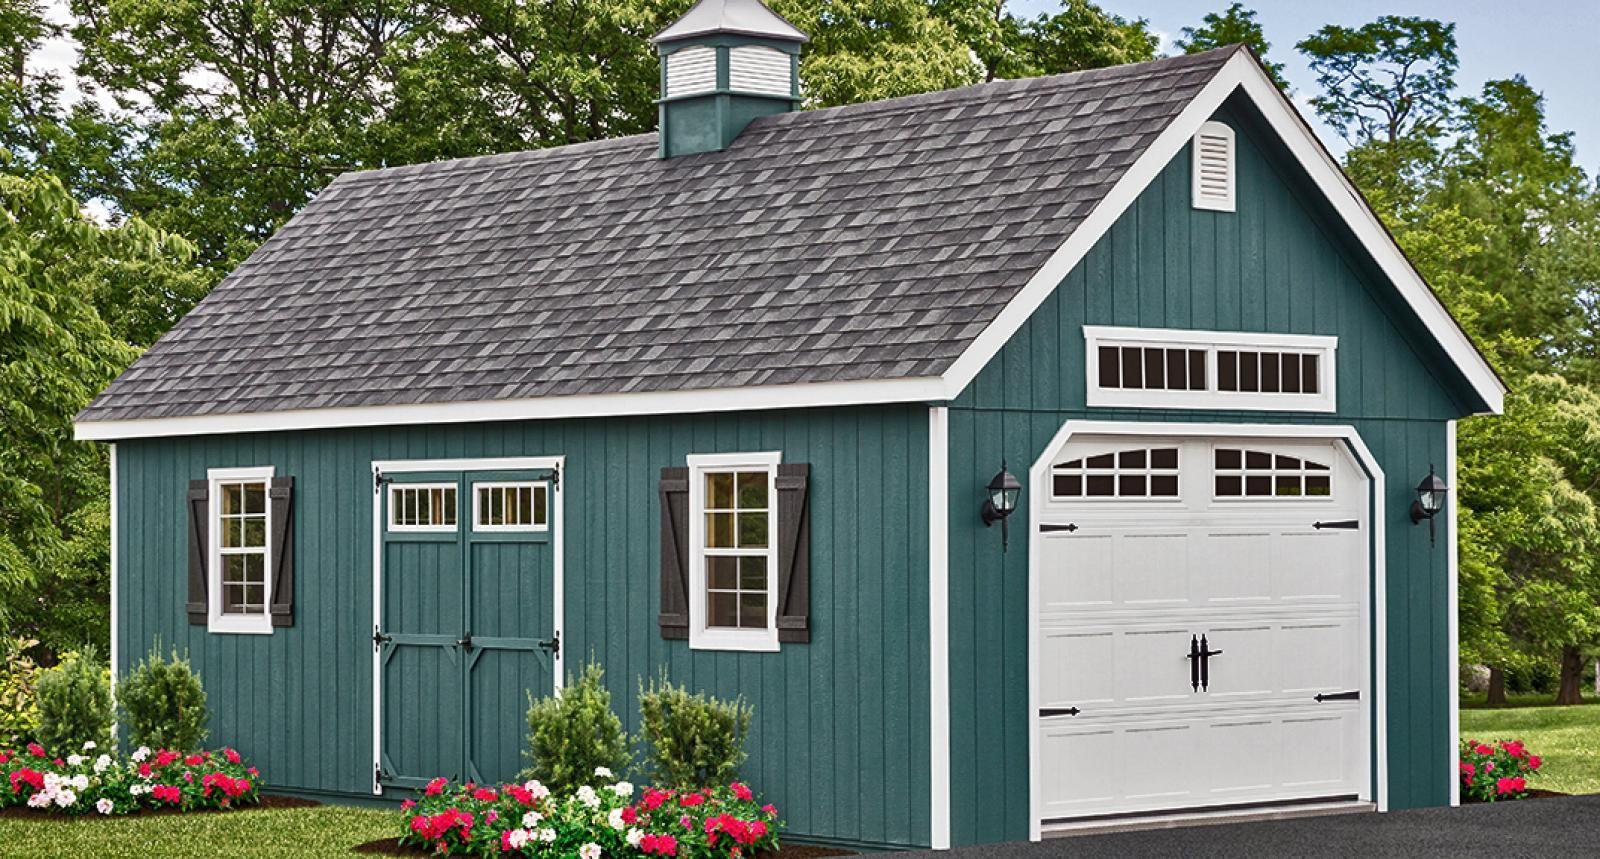 16x24 1 car garage 16x24g5d 384 sq ft excellent floor plans landscaping pinterest car garage garage plans and house - Garden Sheds Florida